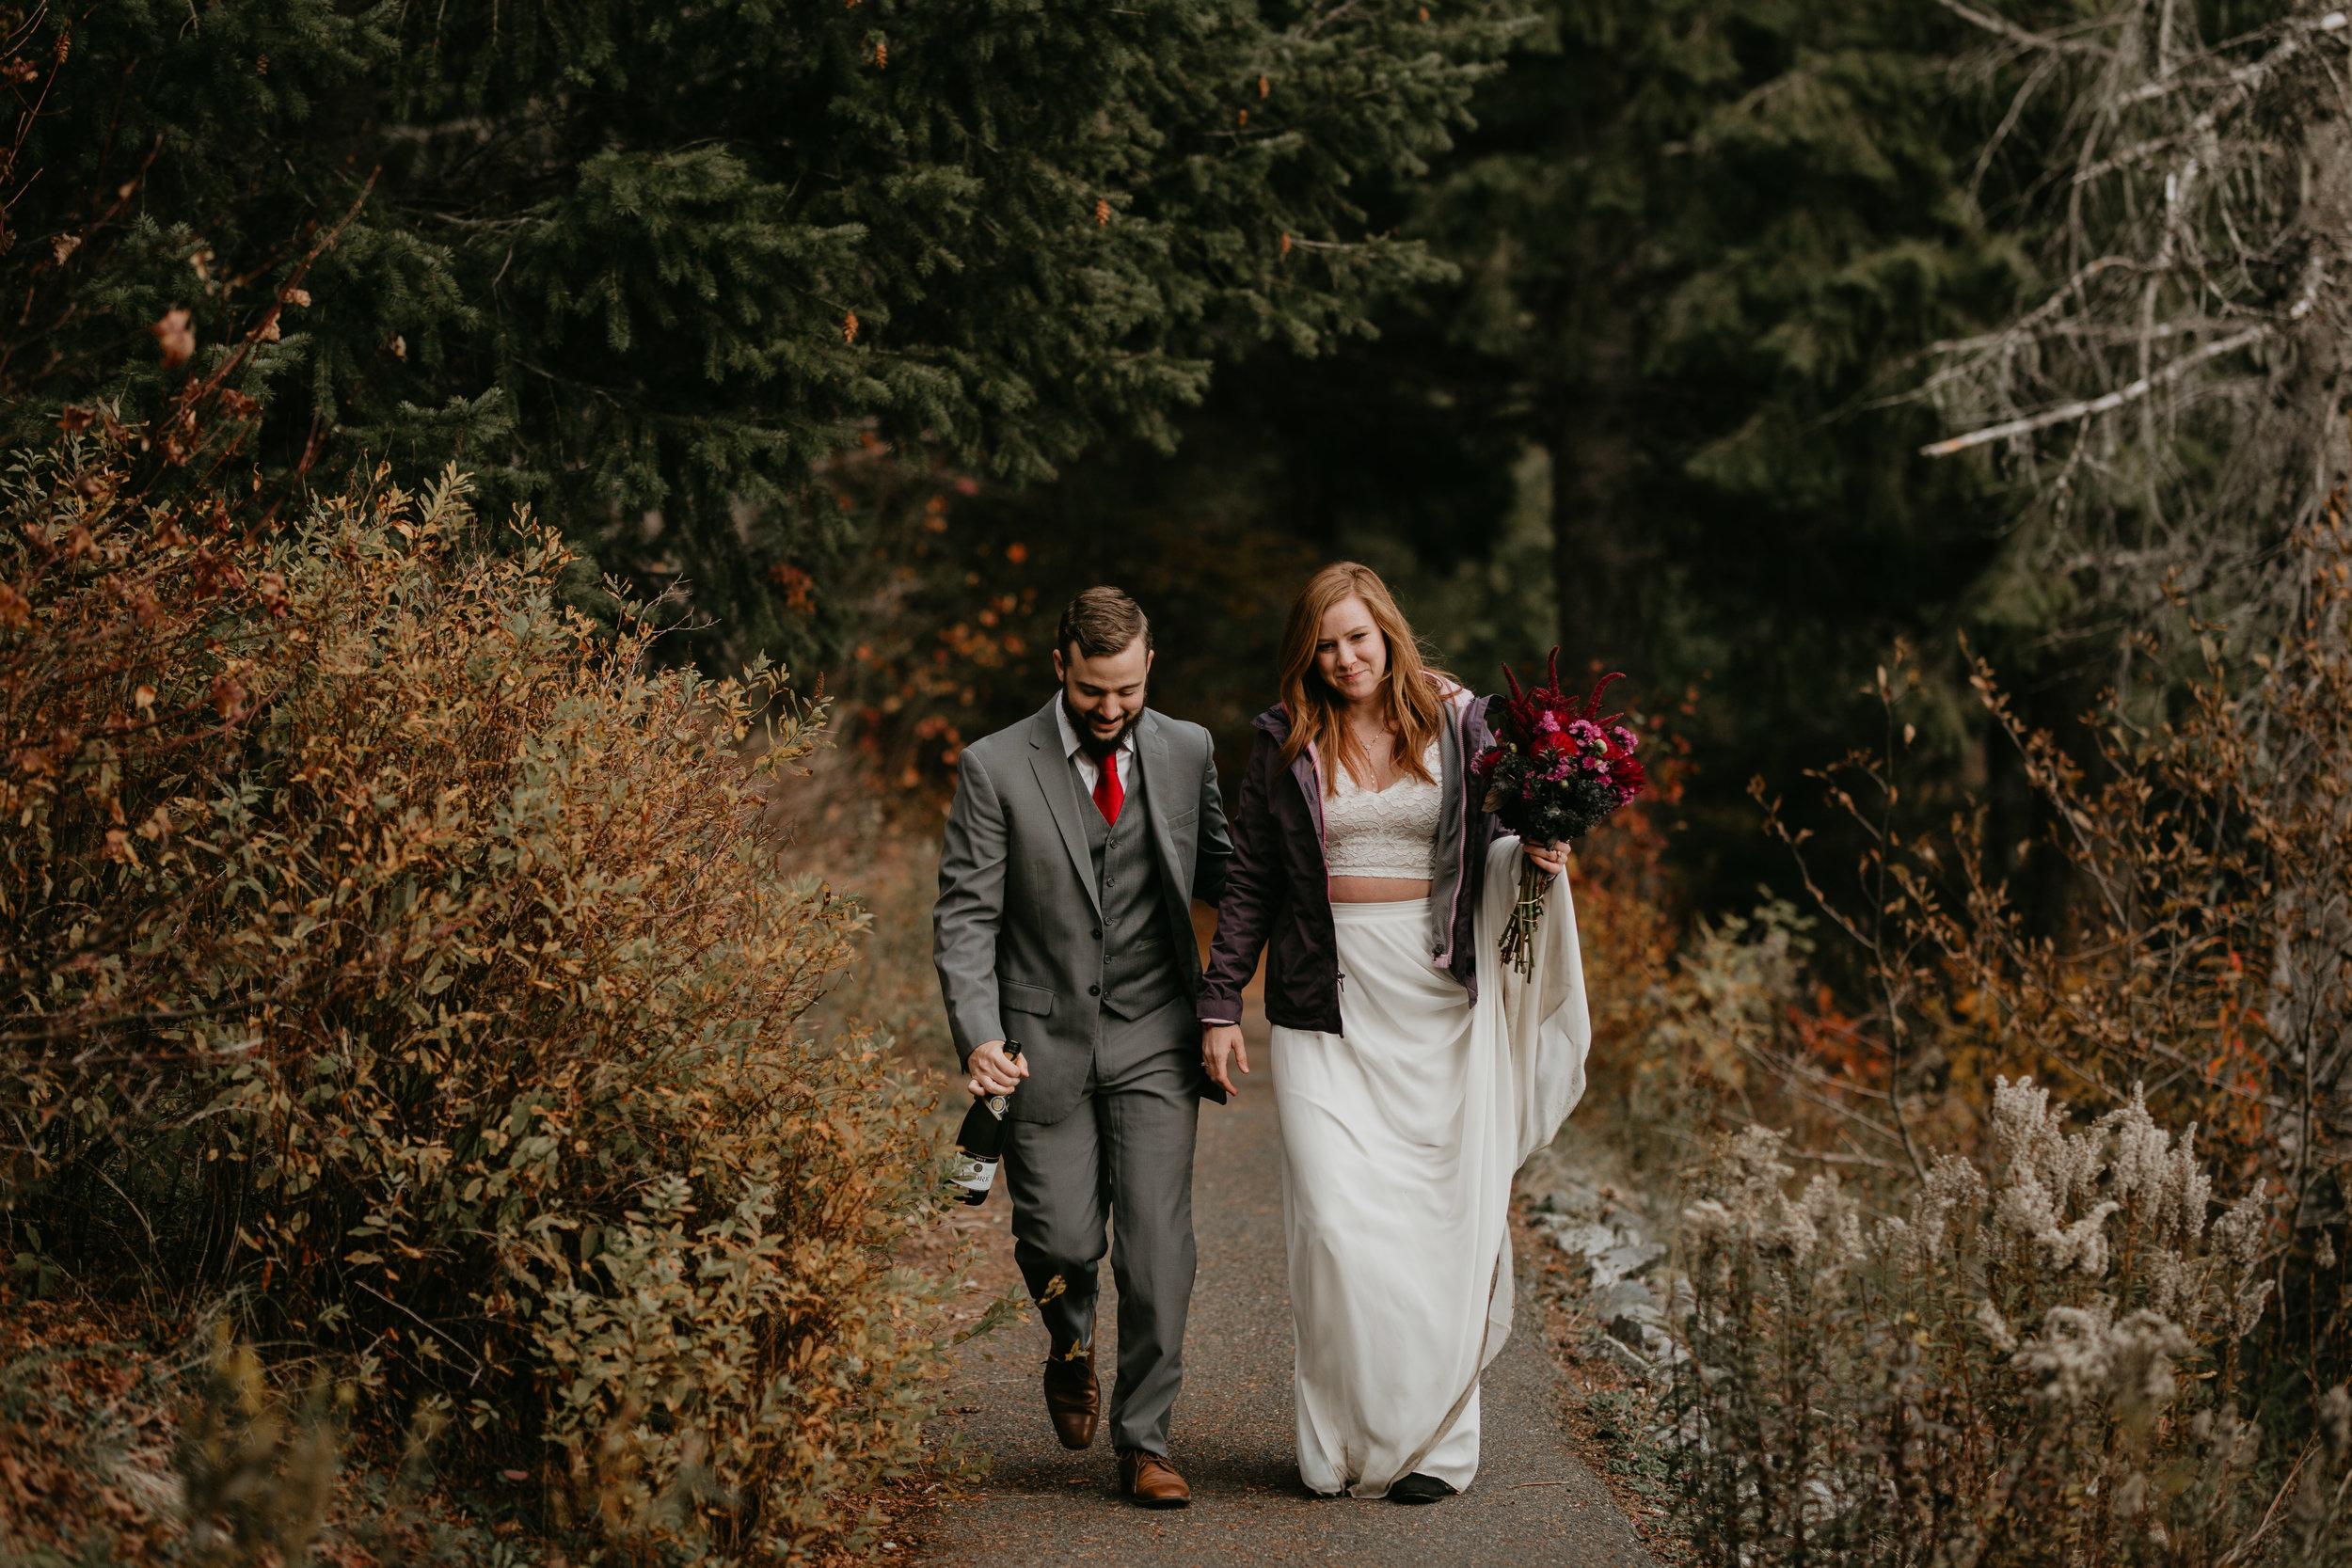 nicole-daacke-photography-mountain-view-elopement-at-gold-creek-pond-snoqualmie-washington-wa-elopement-photographer-photography-adventure-elopement-in-washington-fall-lakeside-golden-sunset-boho-fun-bride-2829.jpg